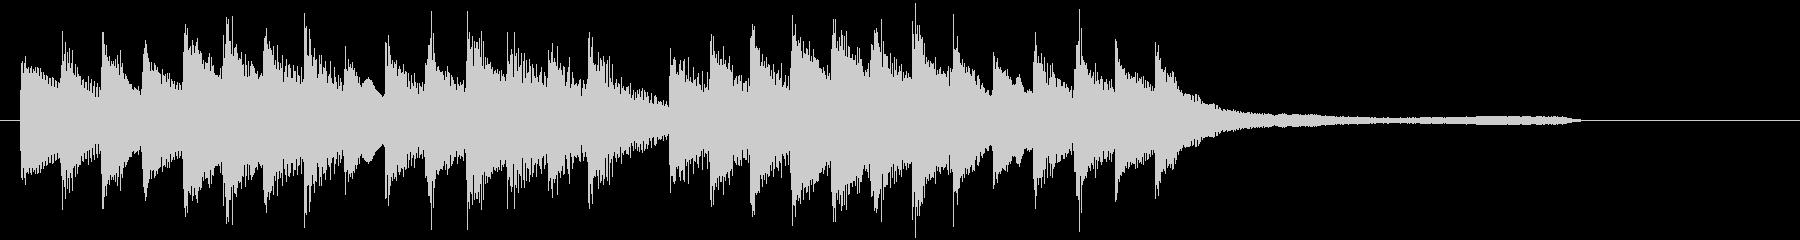 CM15秒、優しく感動的なピアノソロ13の未再生の波形